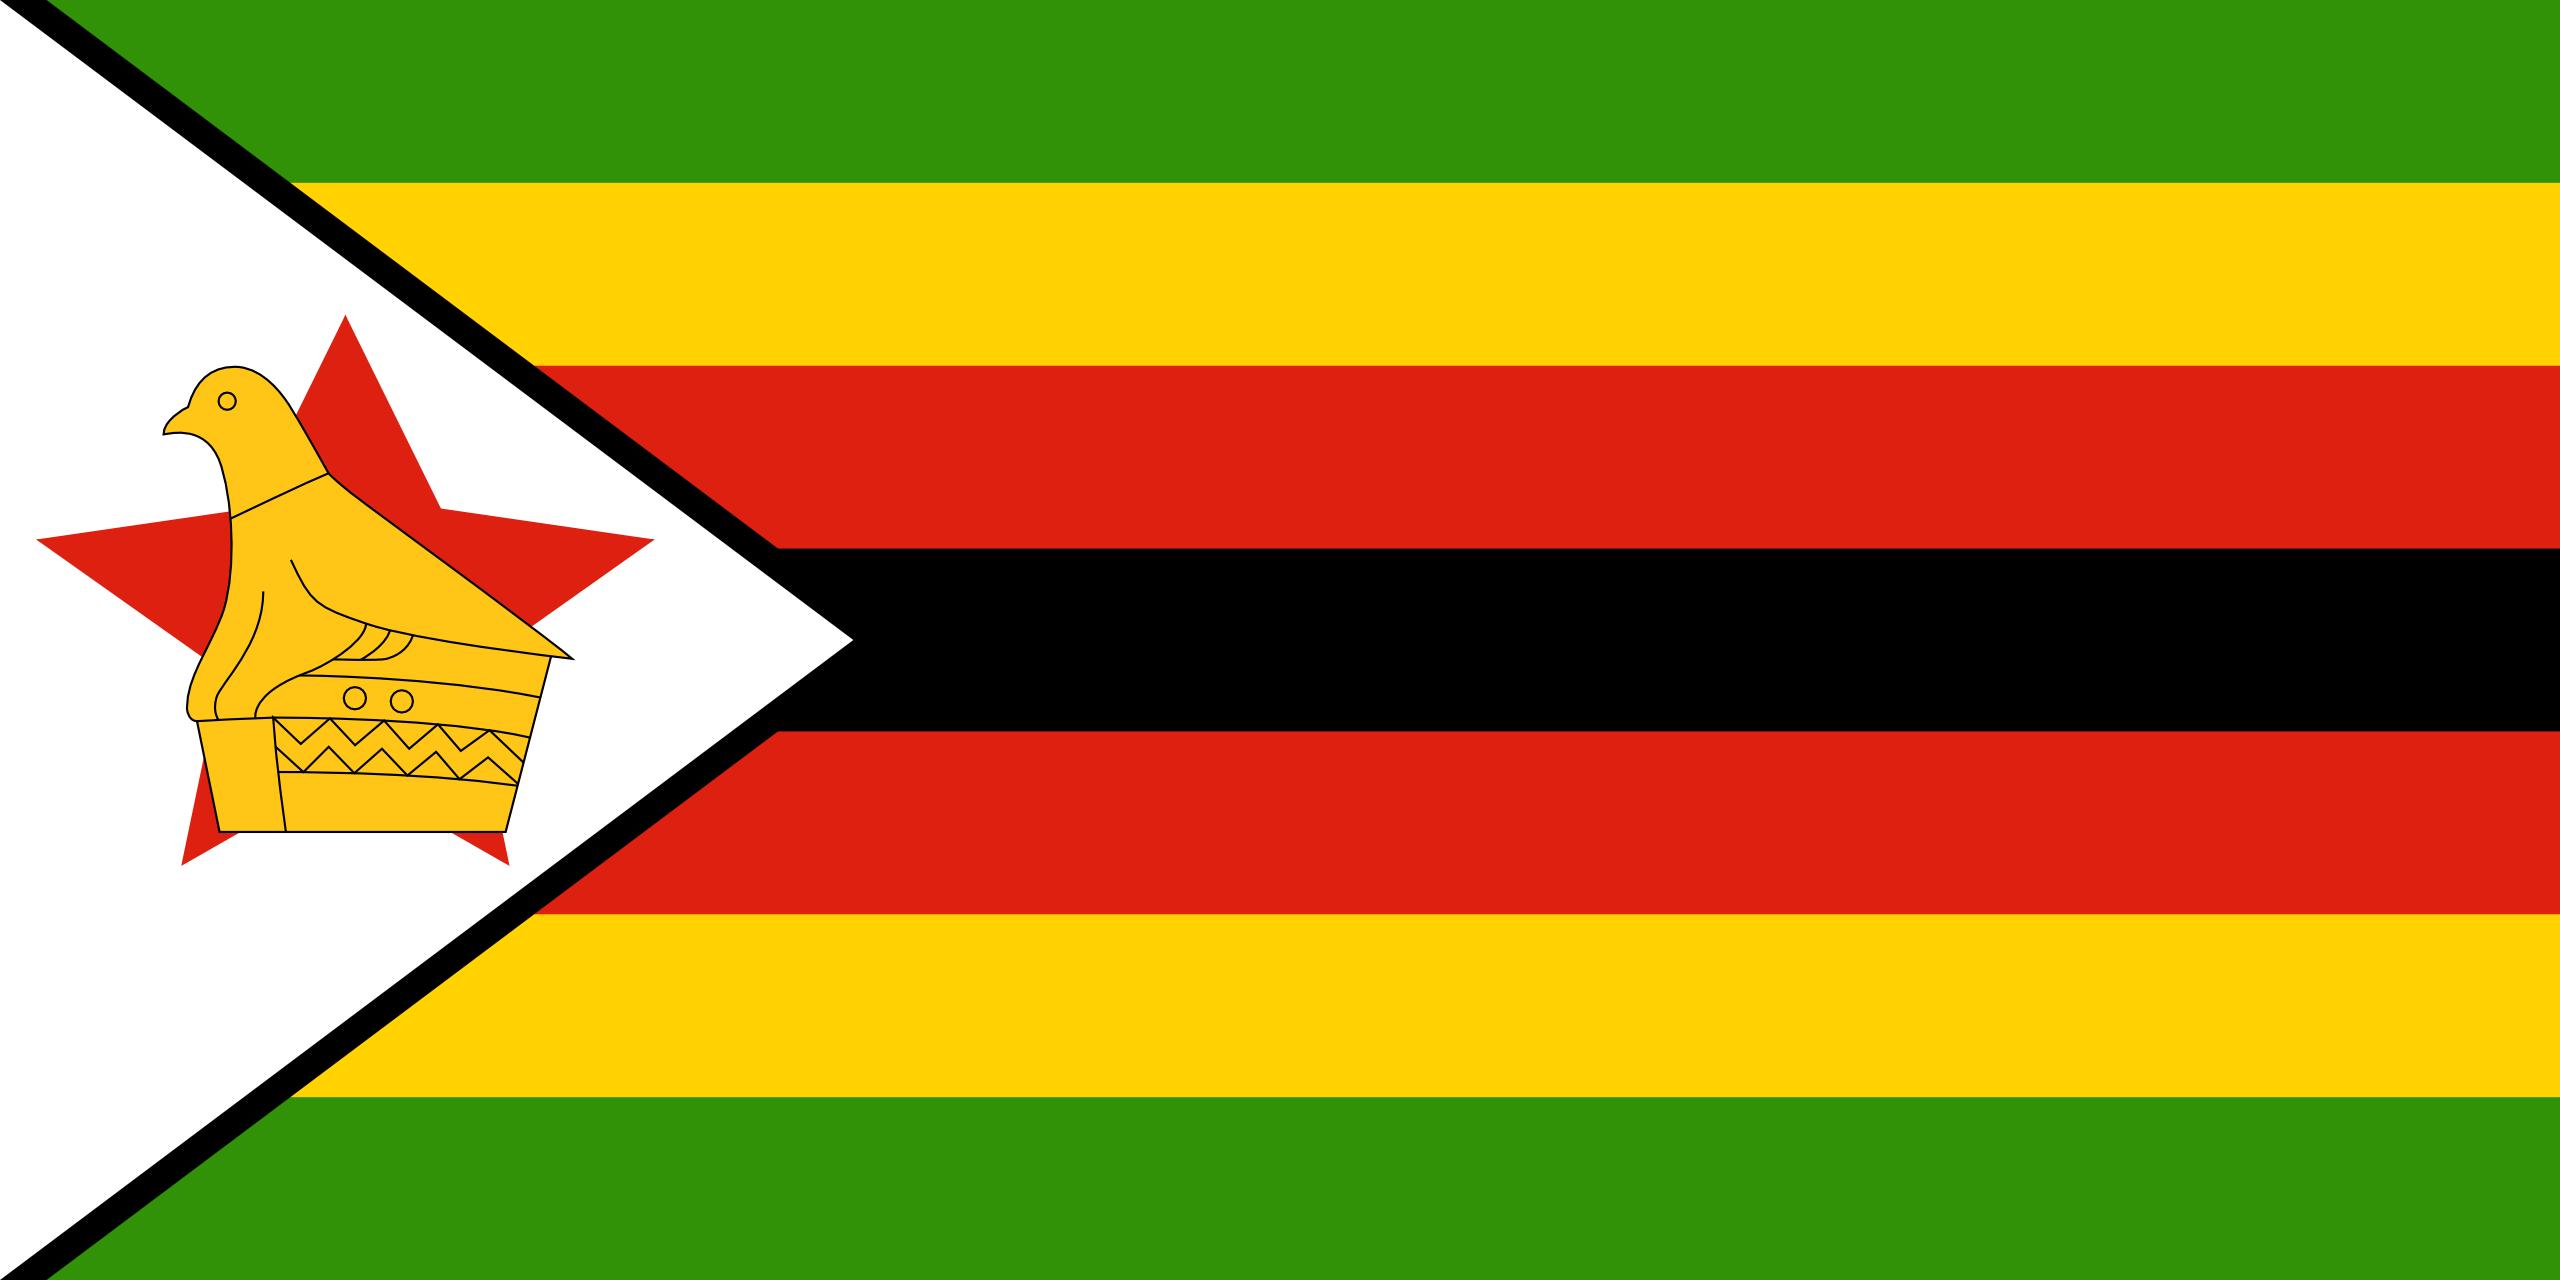 zimbabue, país, emblema, insignia, σύμβολο - Wallpapers HD - Professor-falken.com